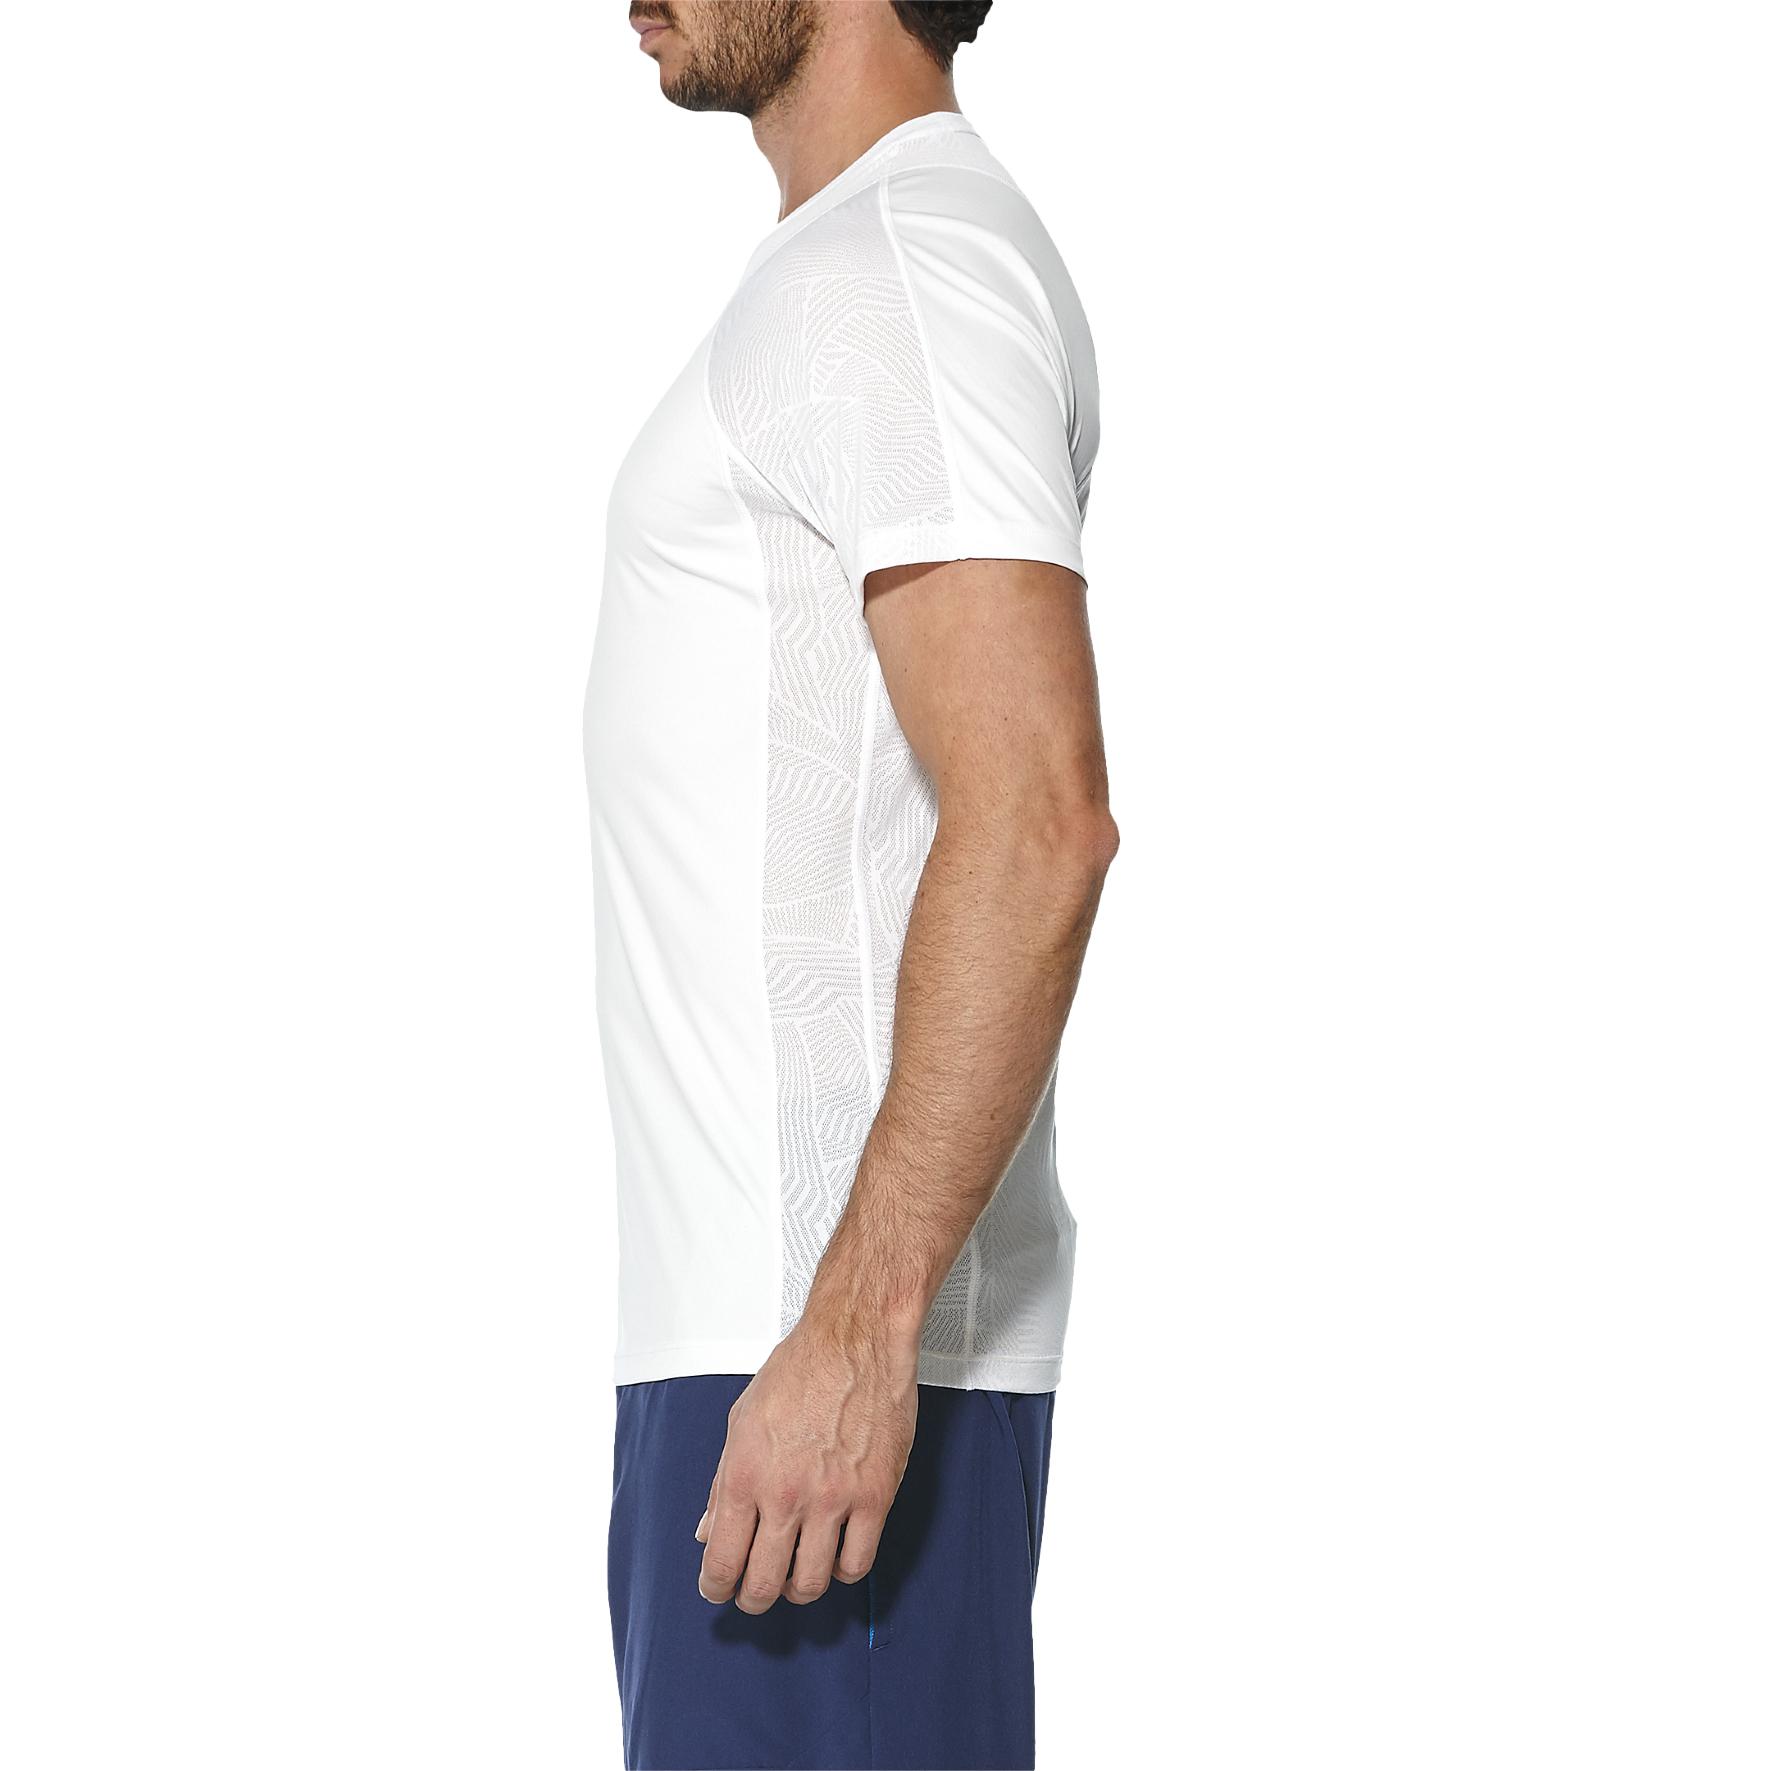 Asics Athlete Cooling Mens Tennis T-Shirt - White, XL